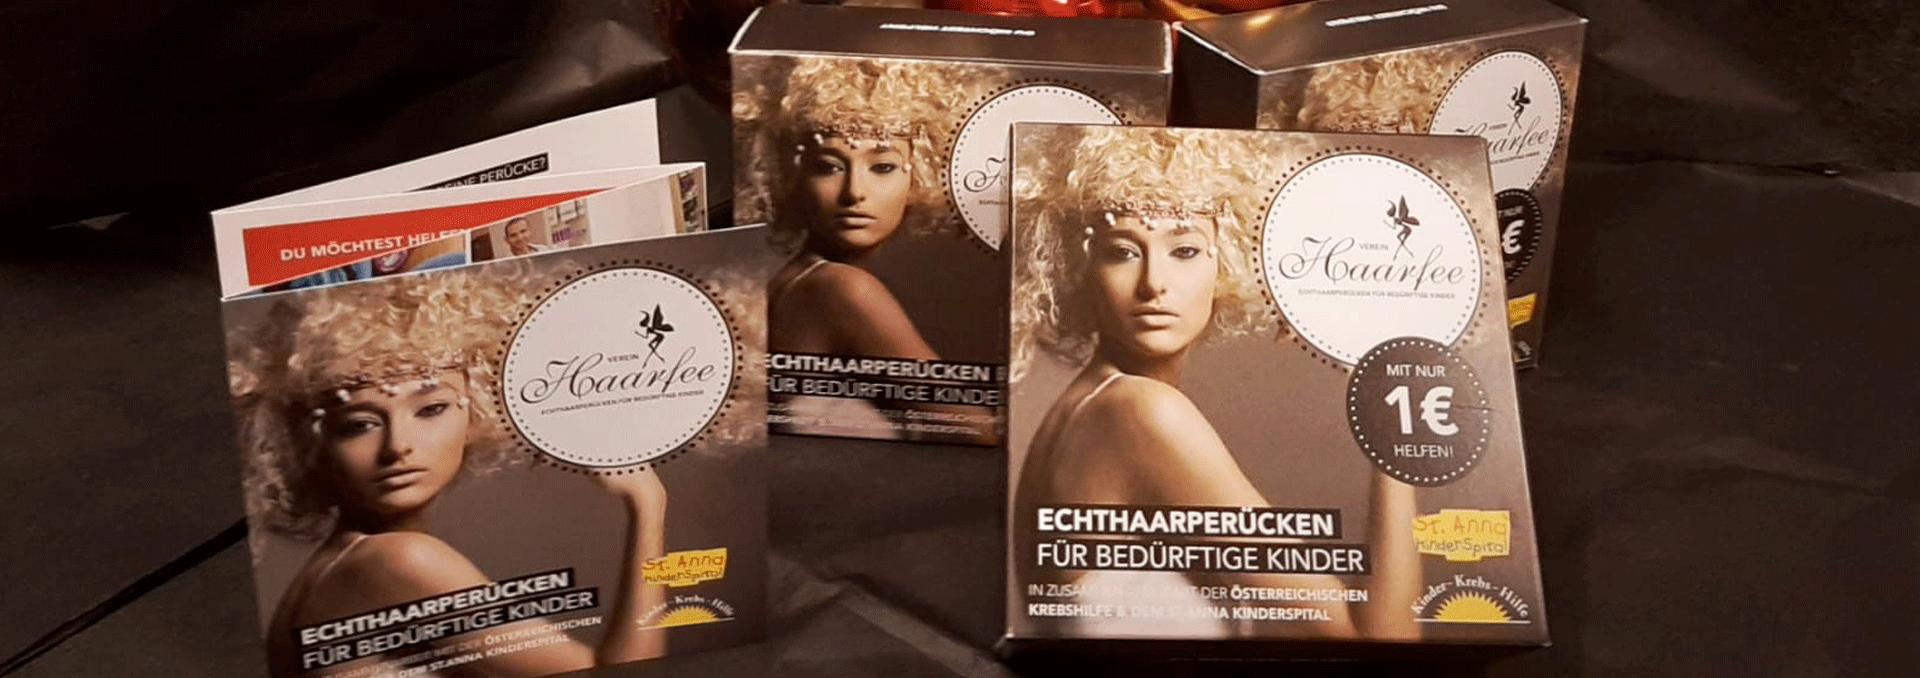 1 Euro Spendenbox